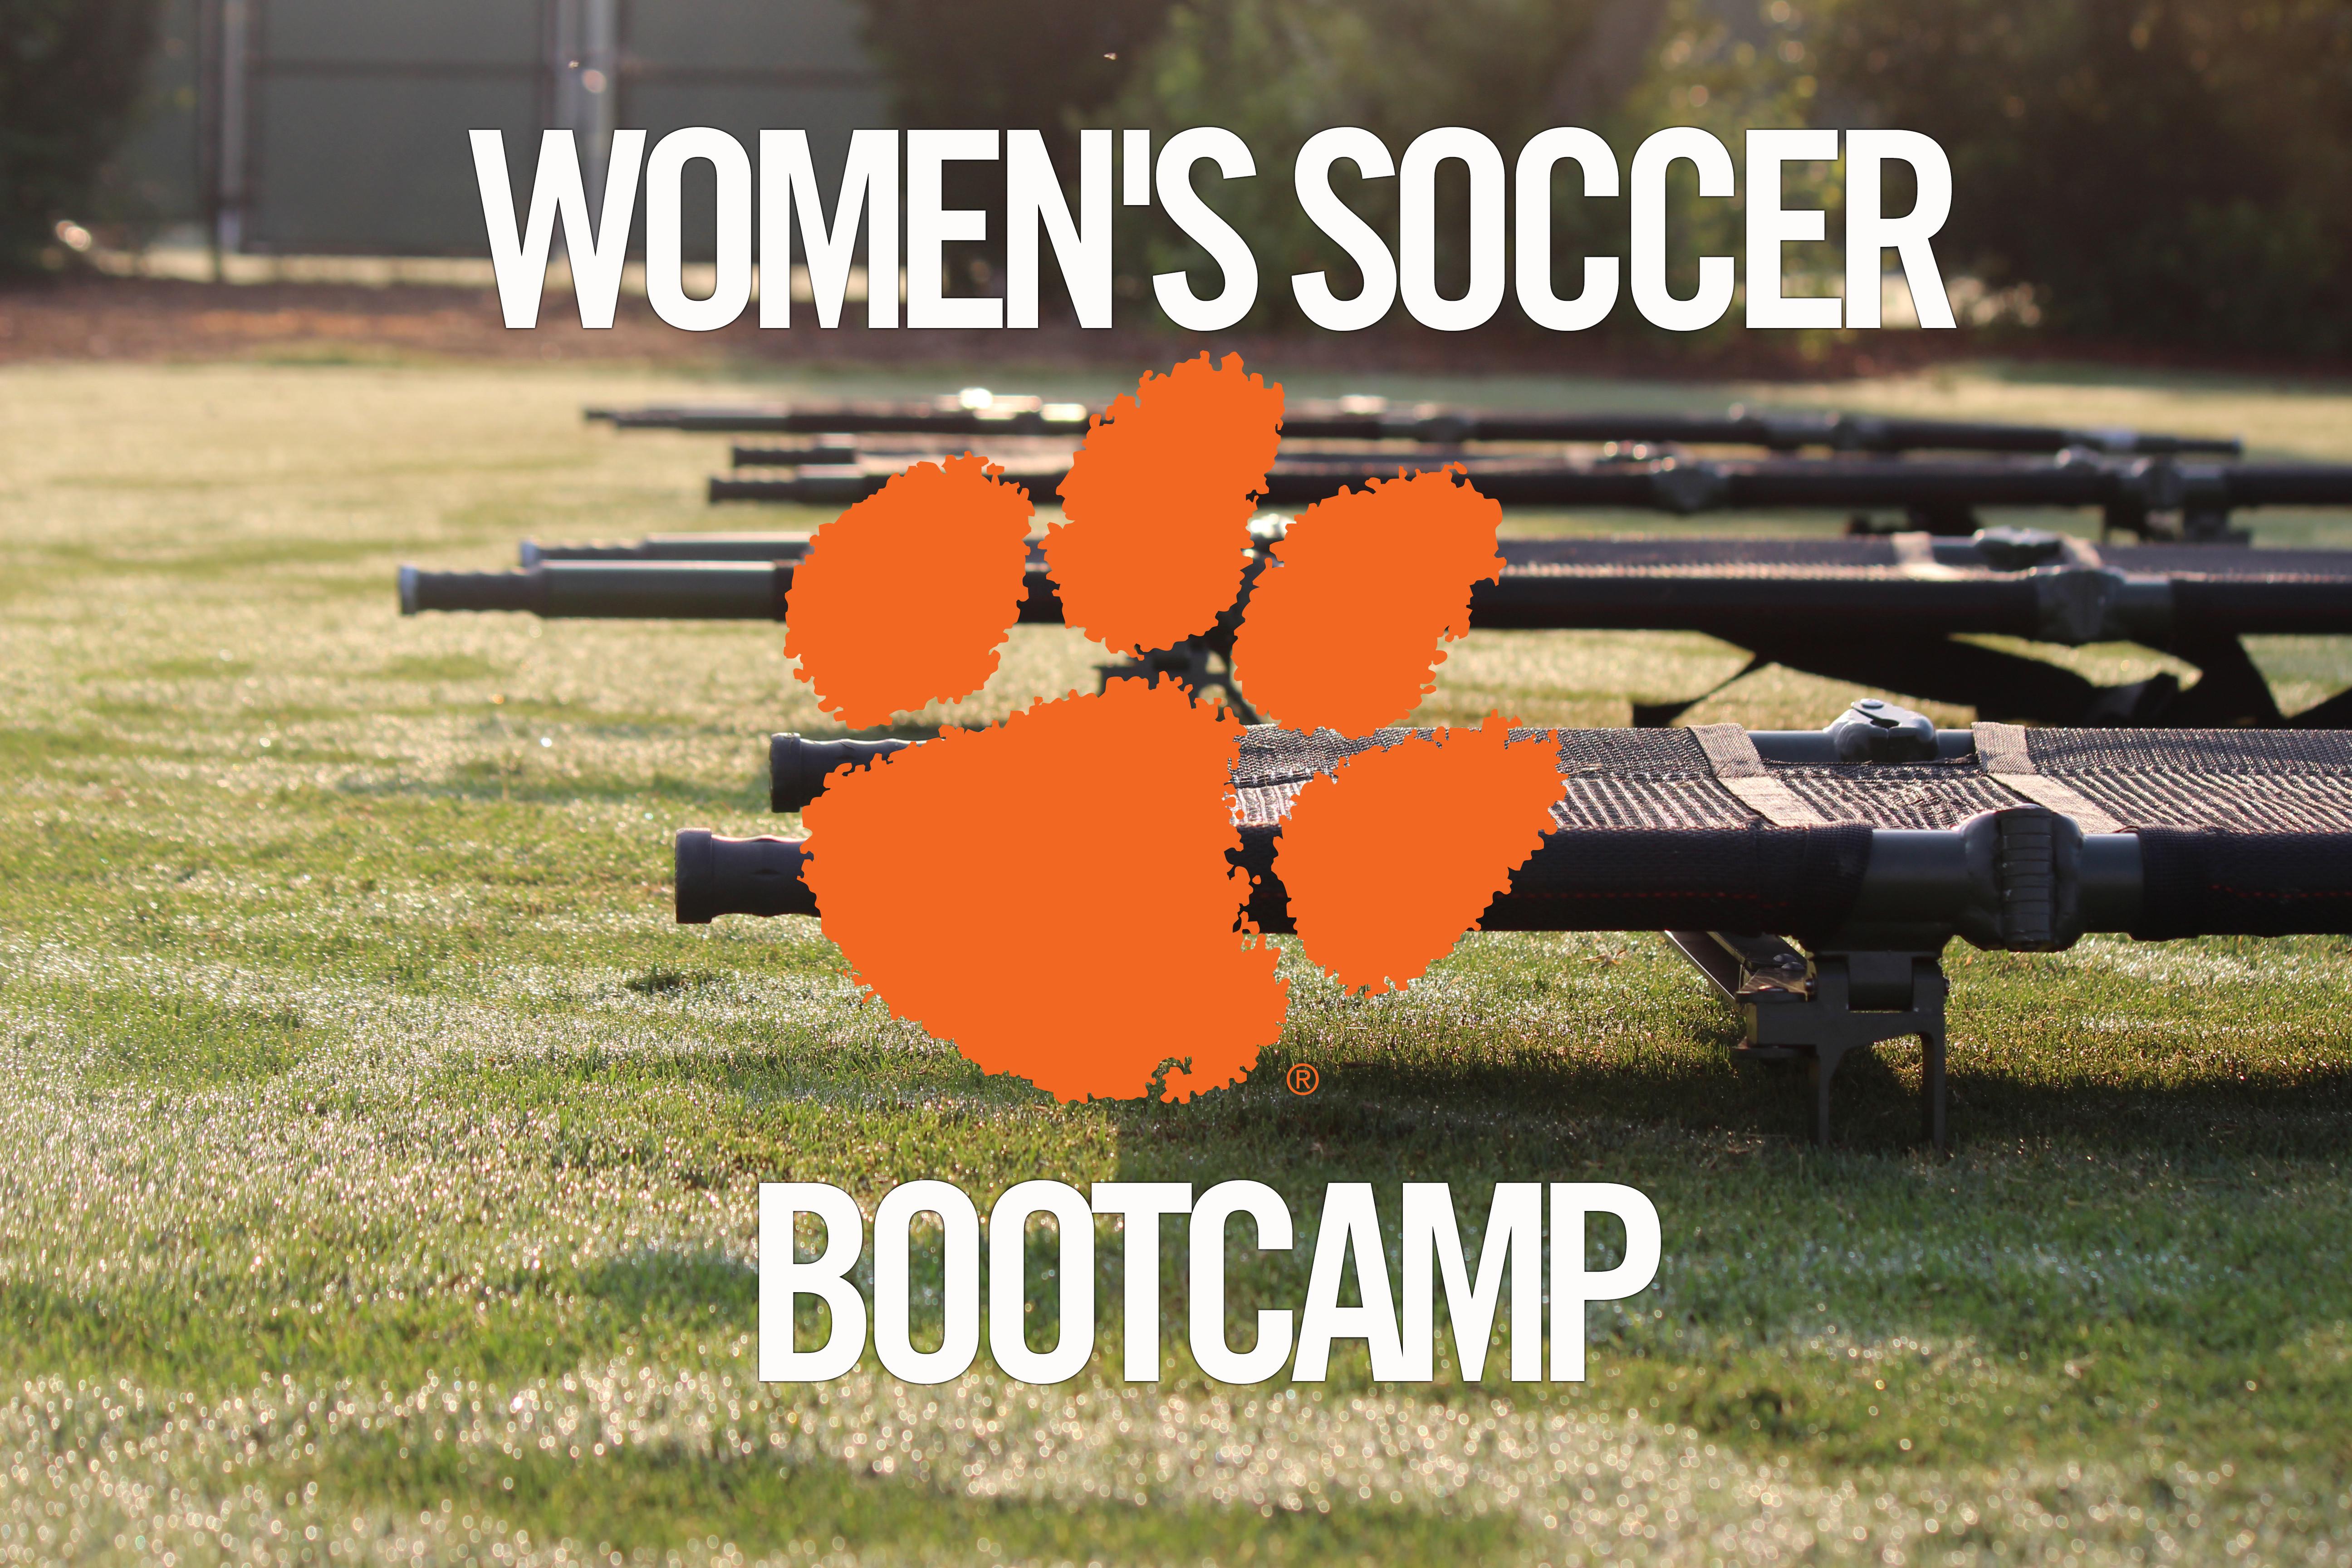 Women's Soccer Bootcamp